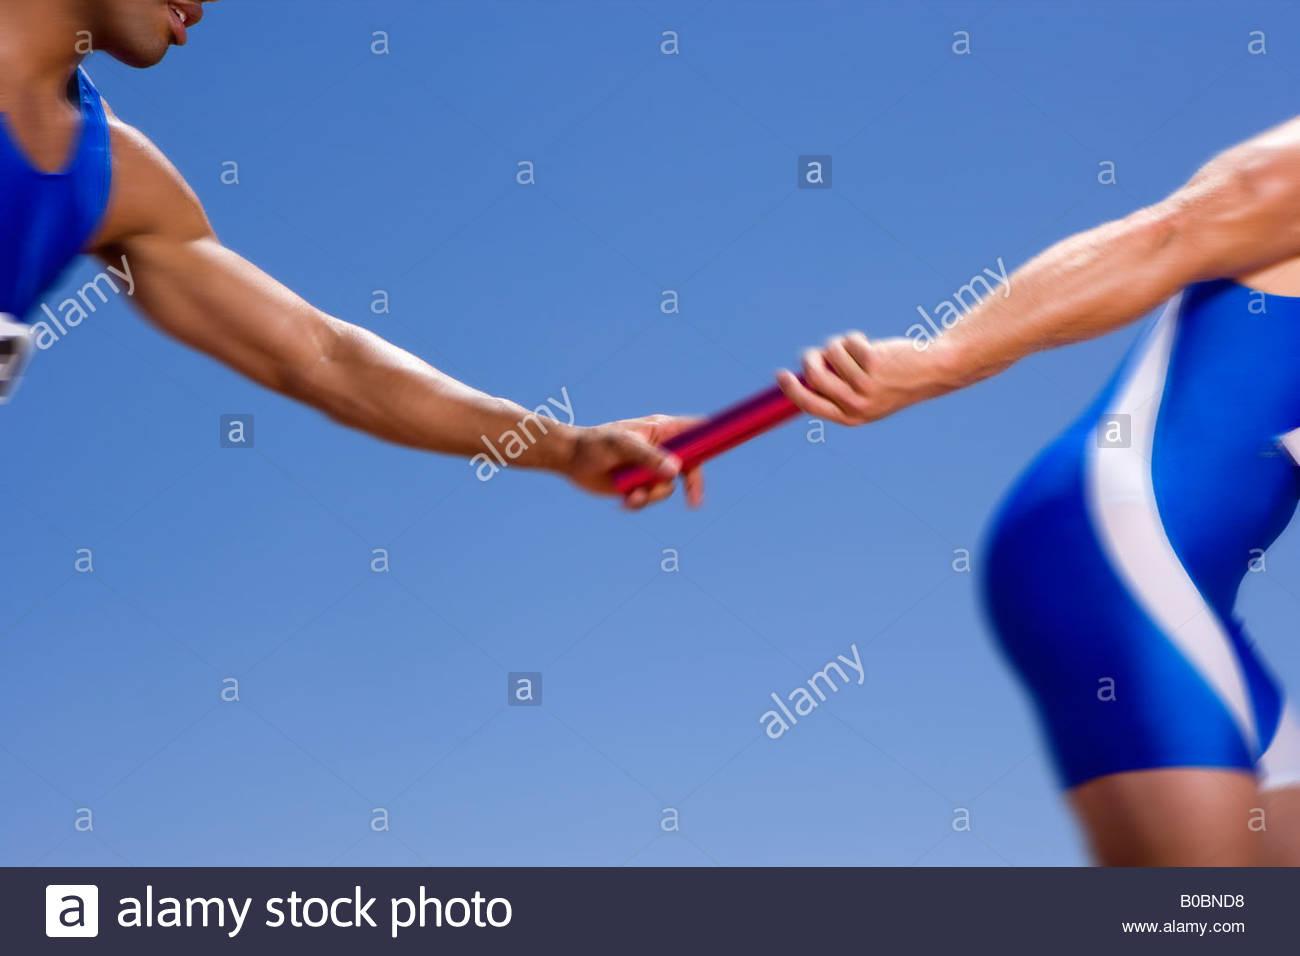 Relay athletes passing baton blurred motion - Stock Image